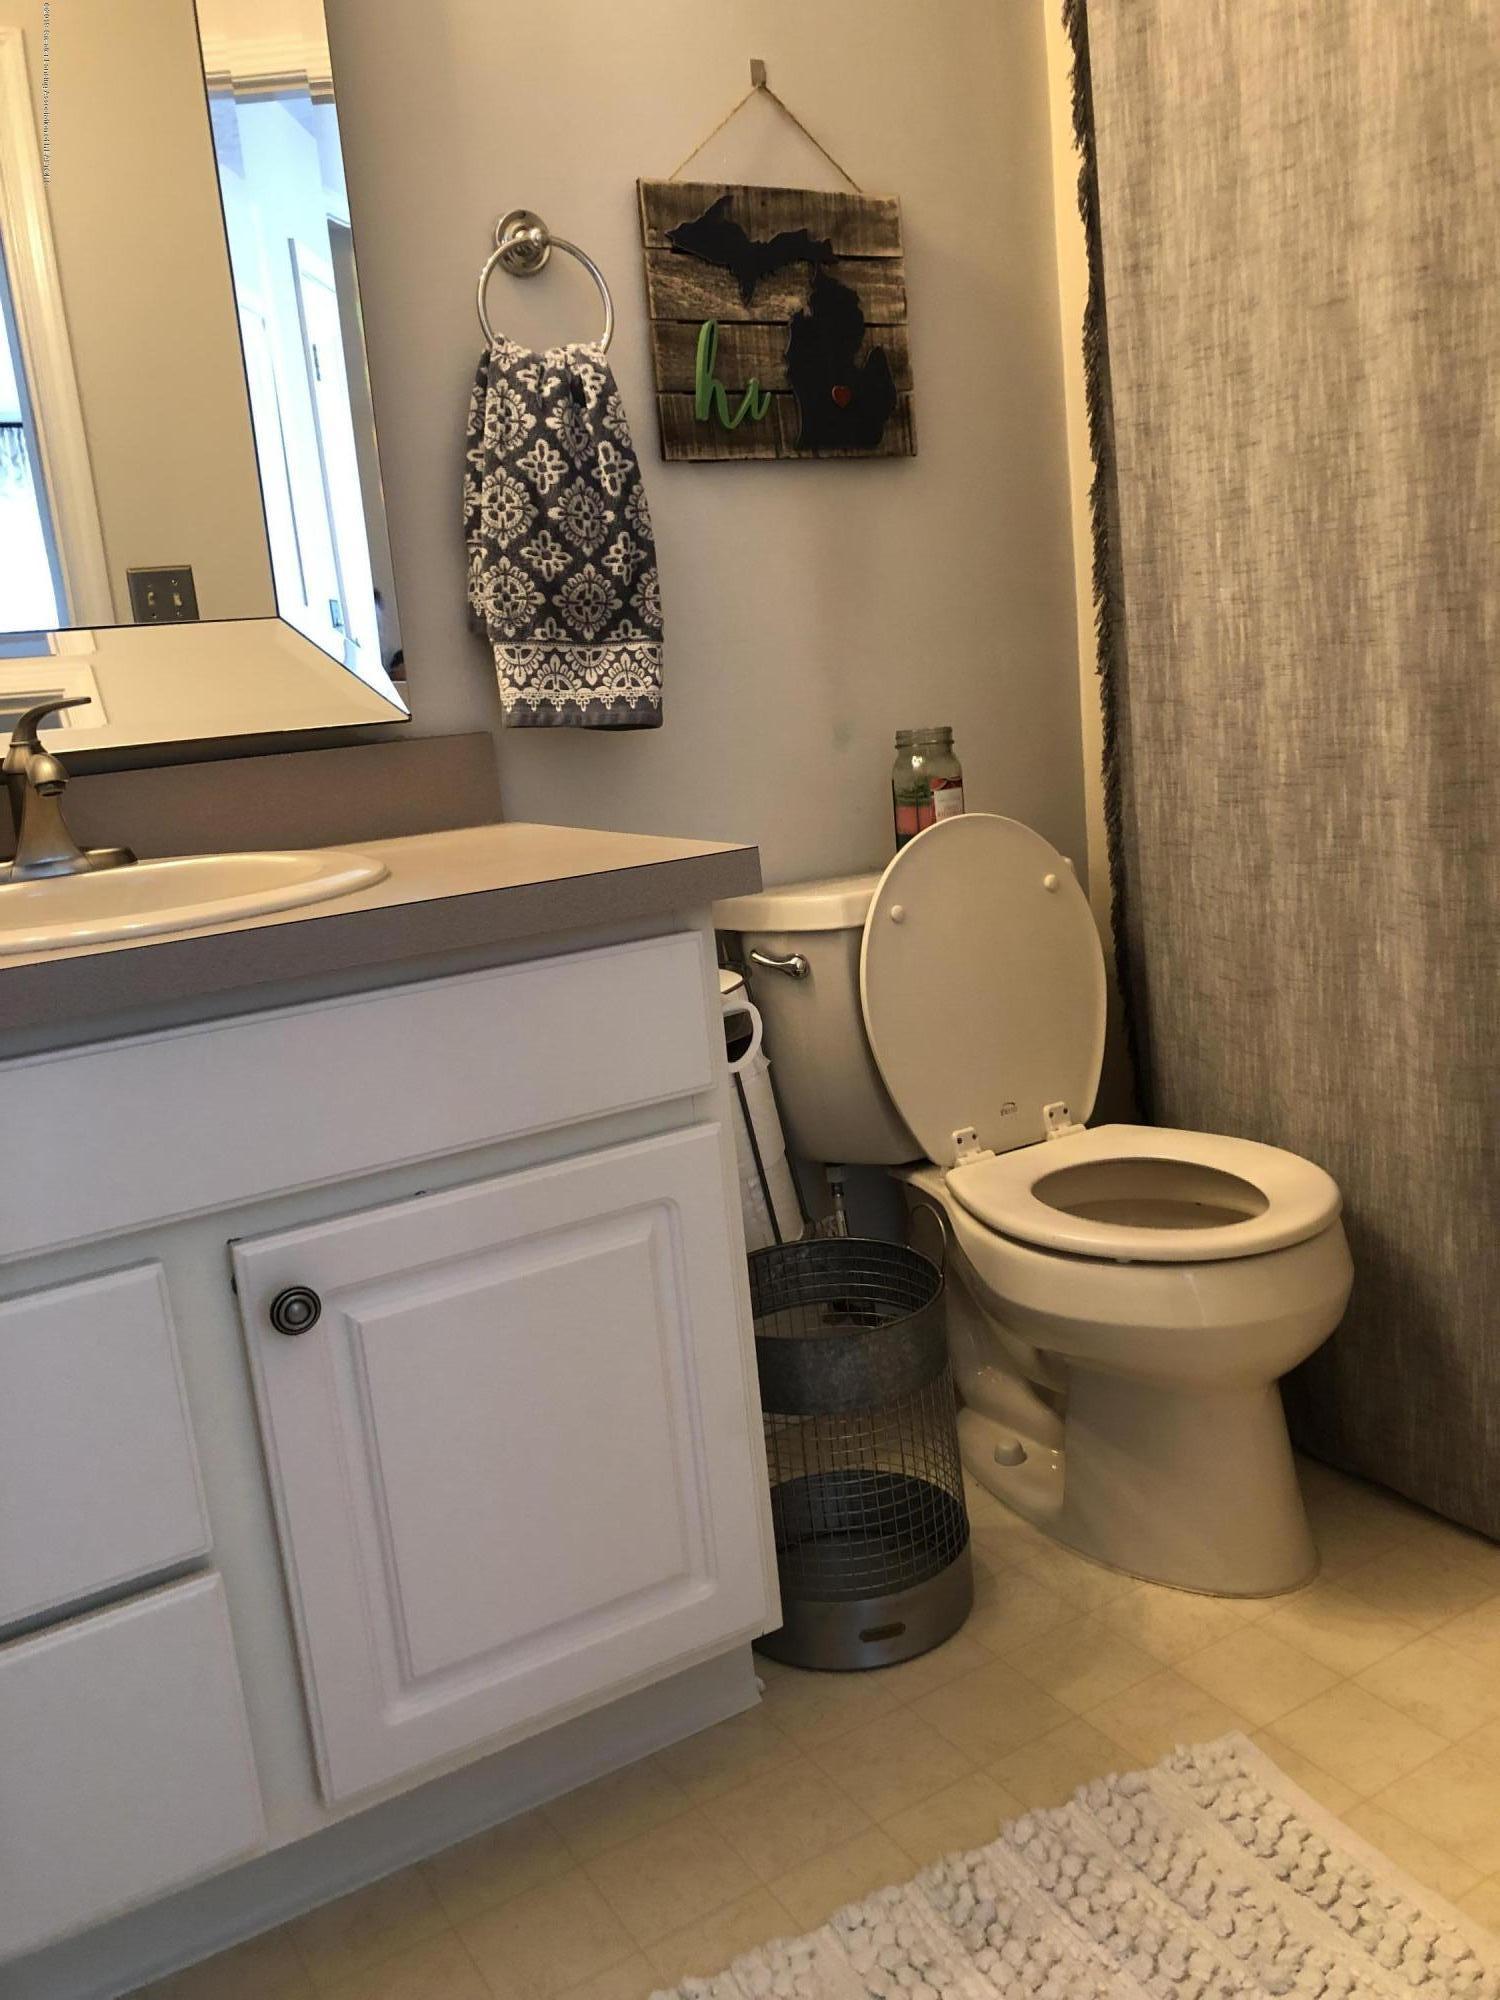 712 Pine Meadow Ln - Upstrs Bathroom - 15